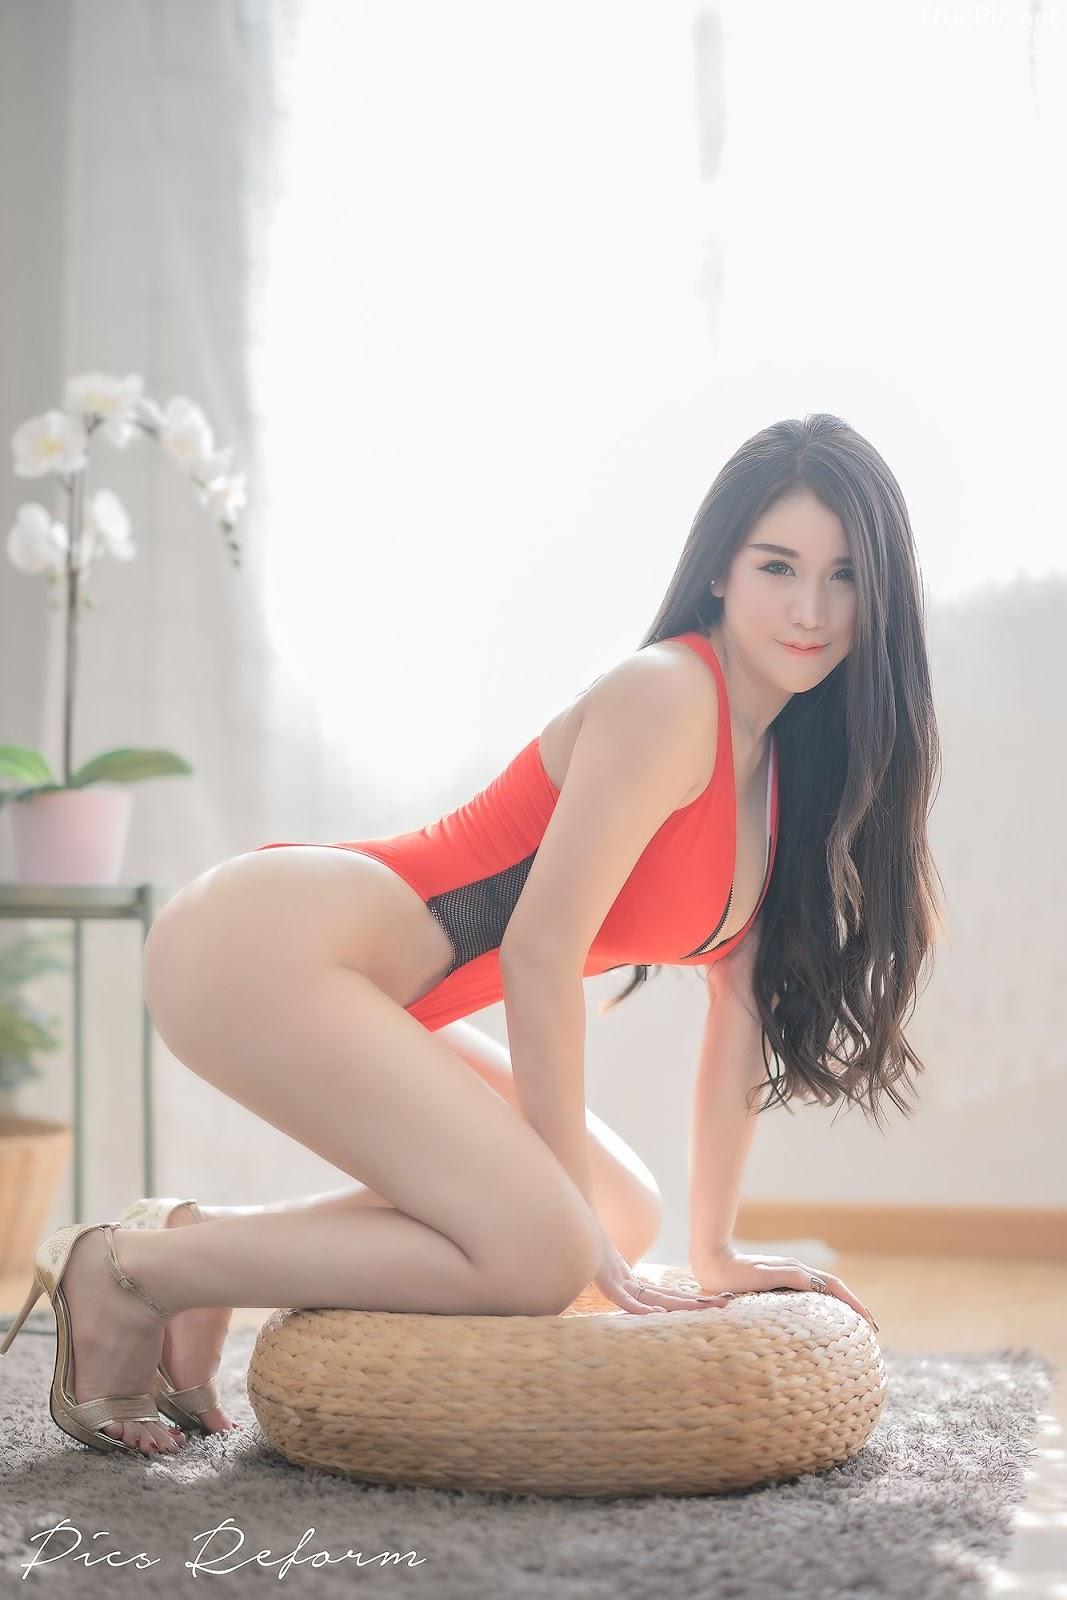 Thailand Sexy Model - Prapatsara Kongpanus - Red Army - TruePic.net - Picture 14